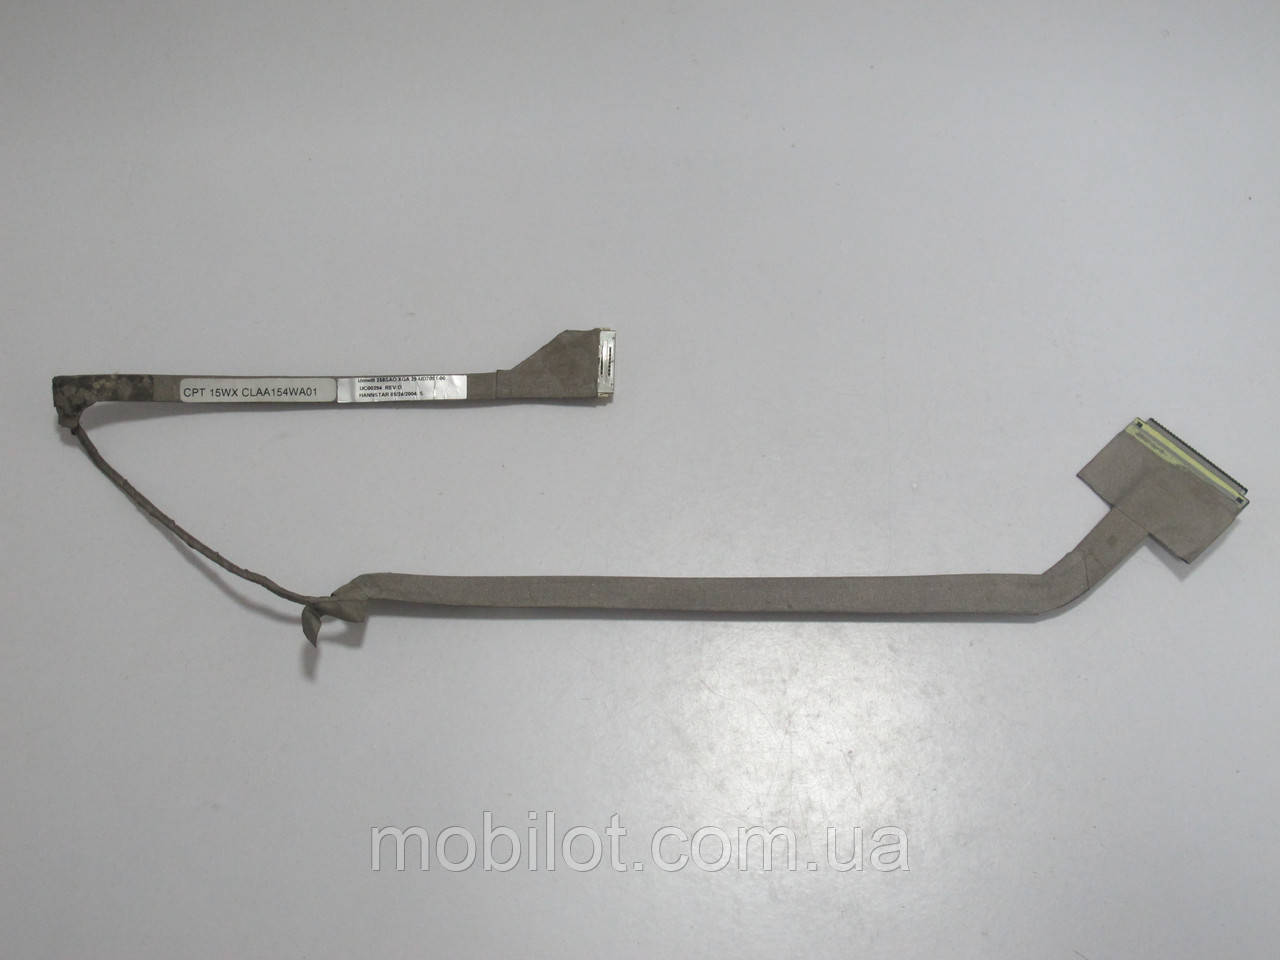 Шлейф матрицы Fujitsu Siemens Amilo D-1840W (NZ-5069)